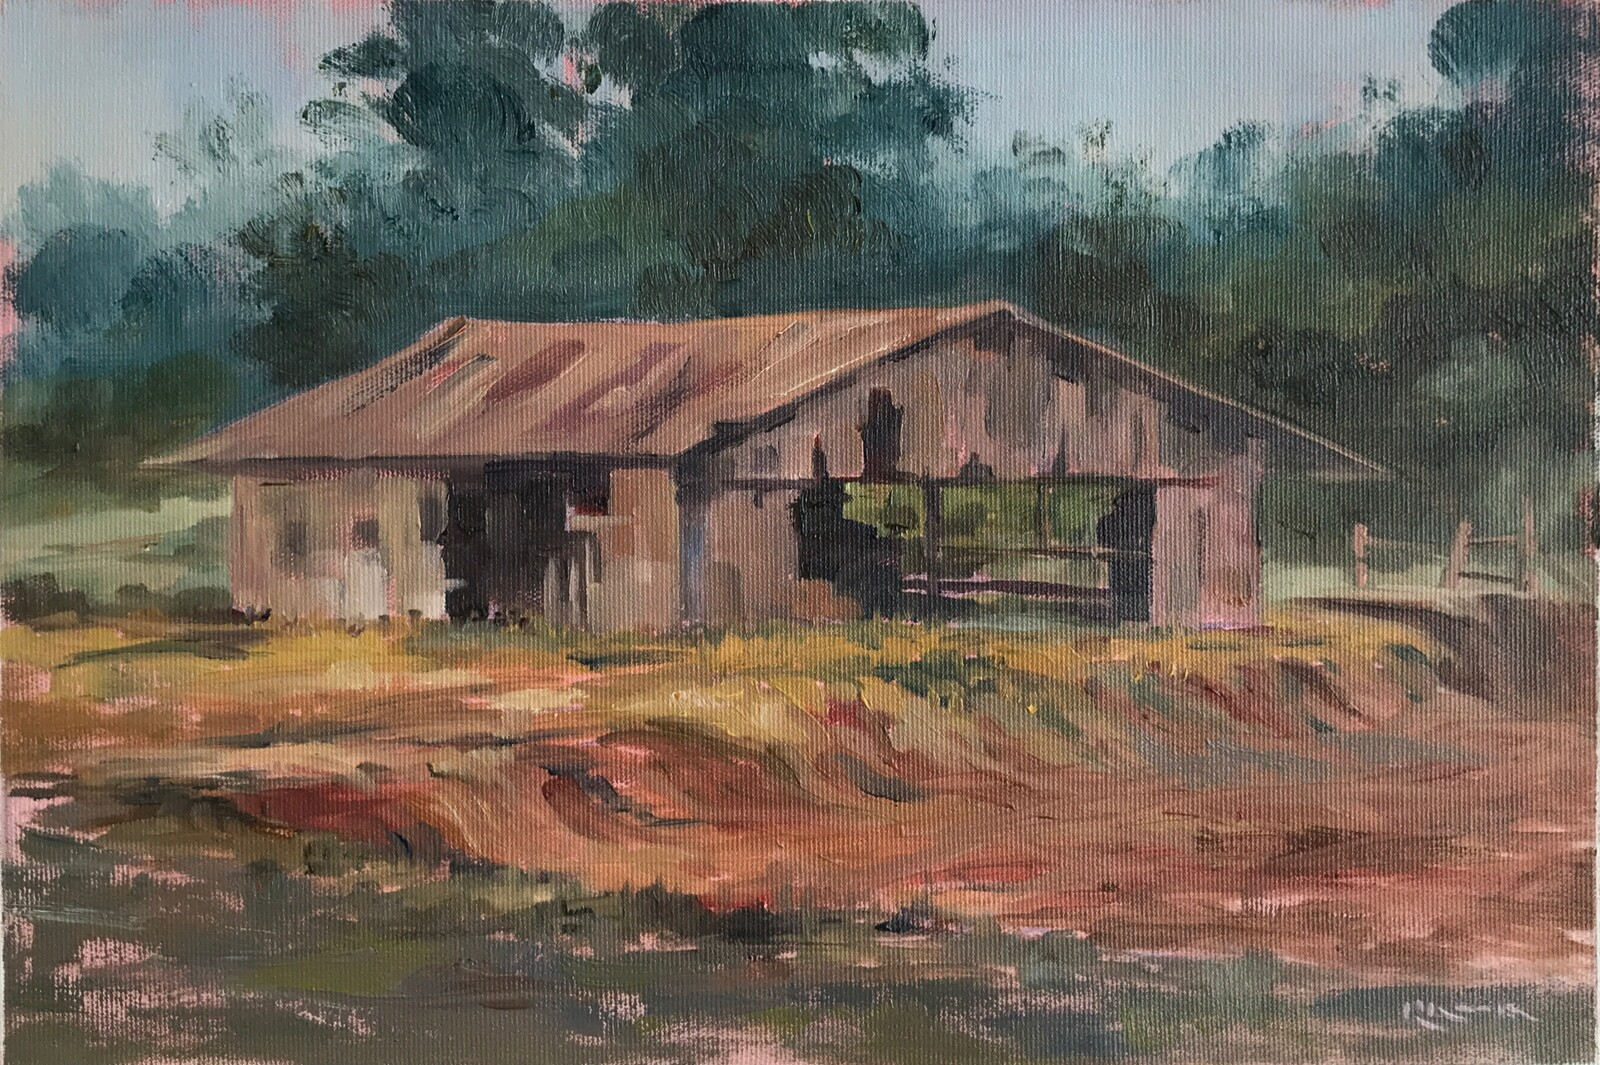 The old stockyard